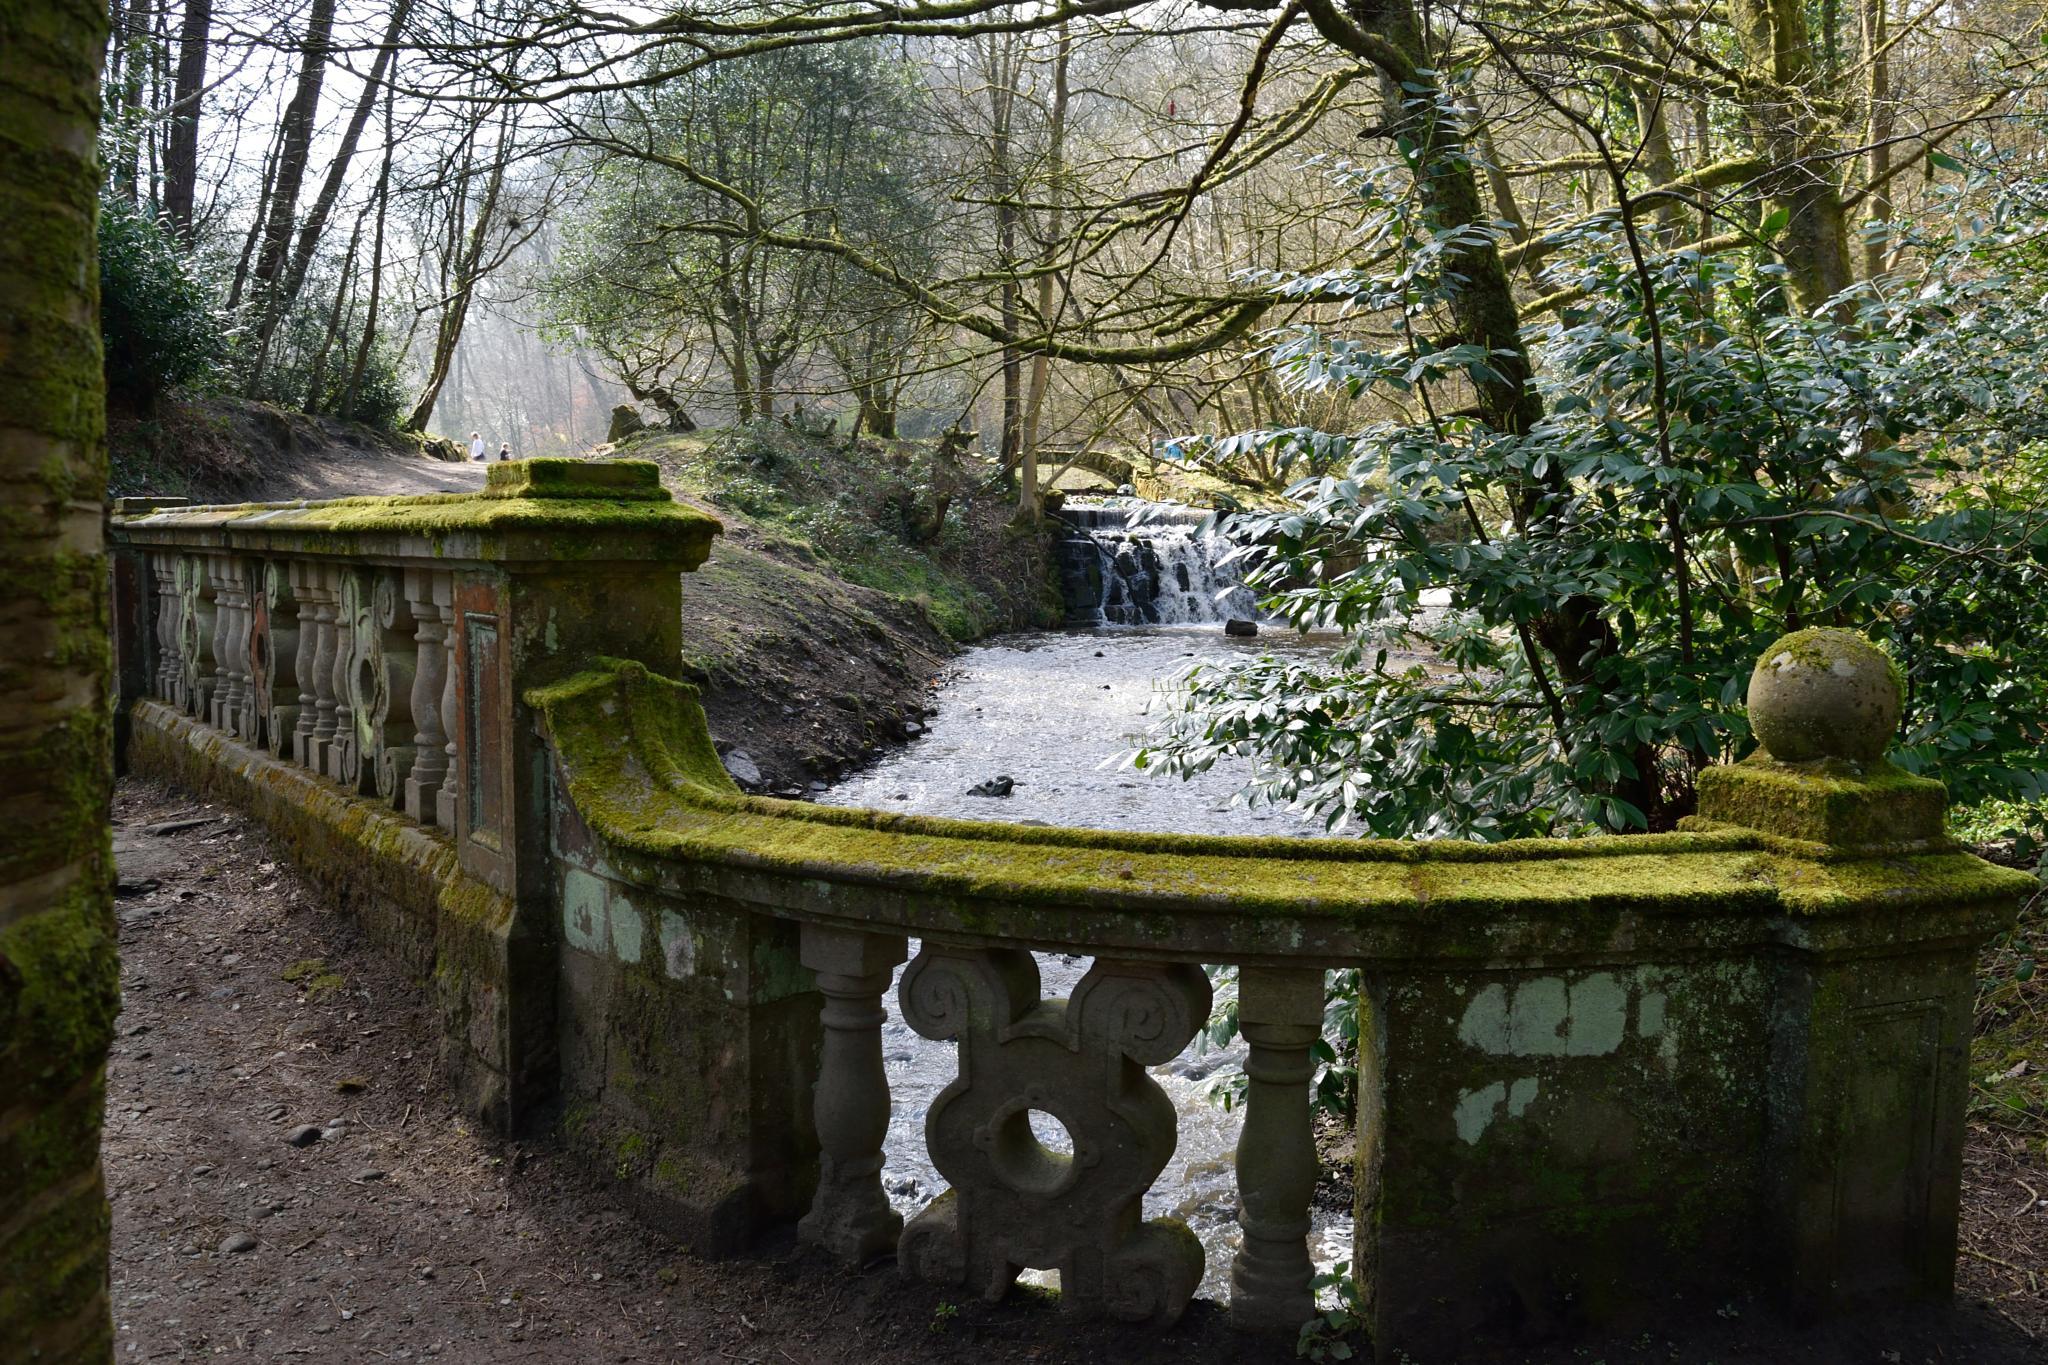 Sunnyhurst Wood - Darwen by GaryMHough